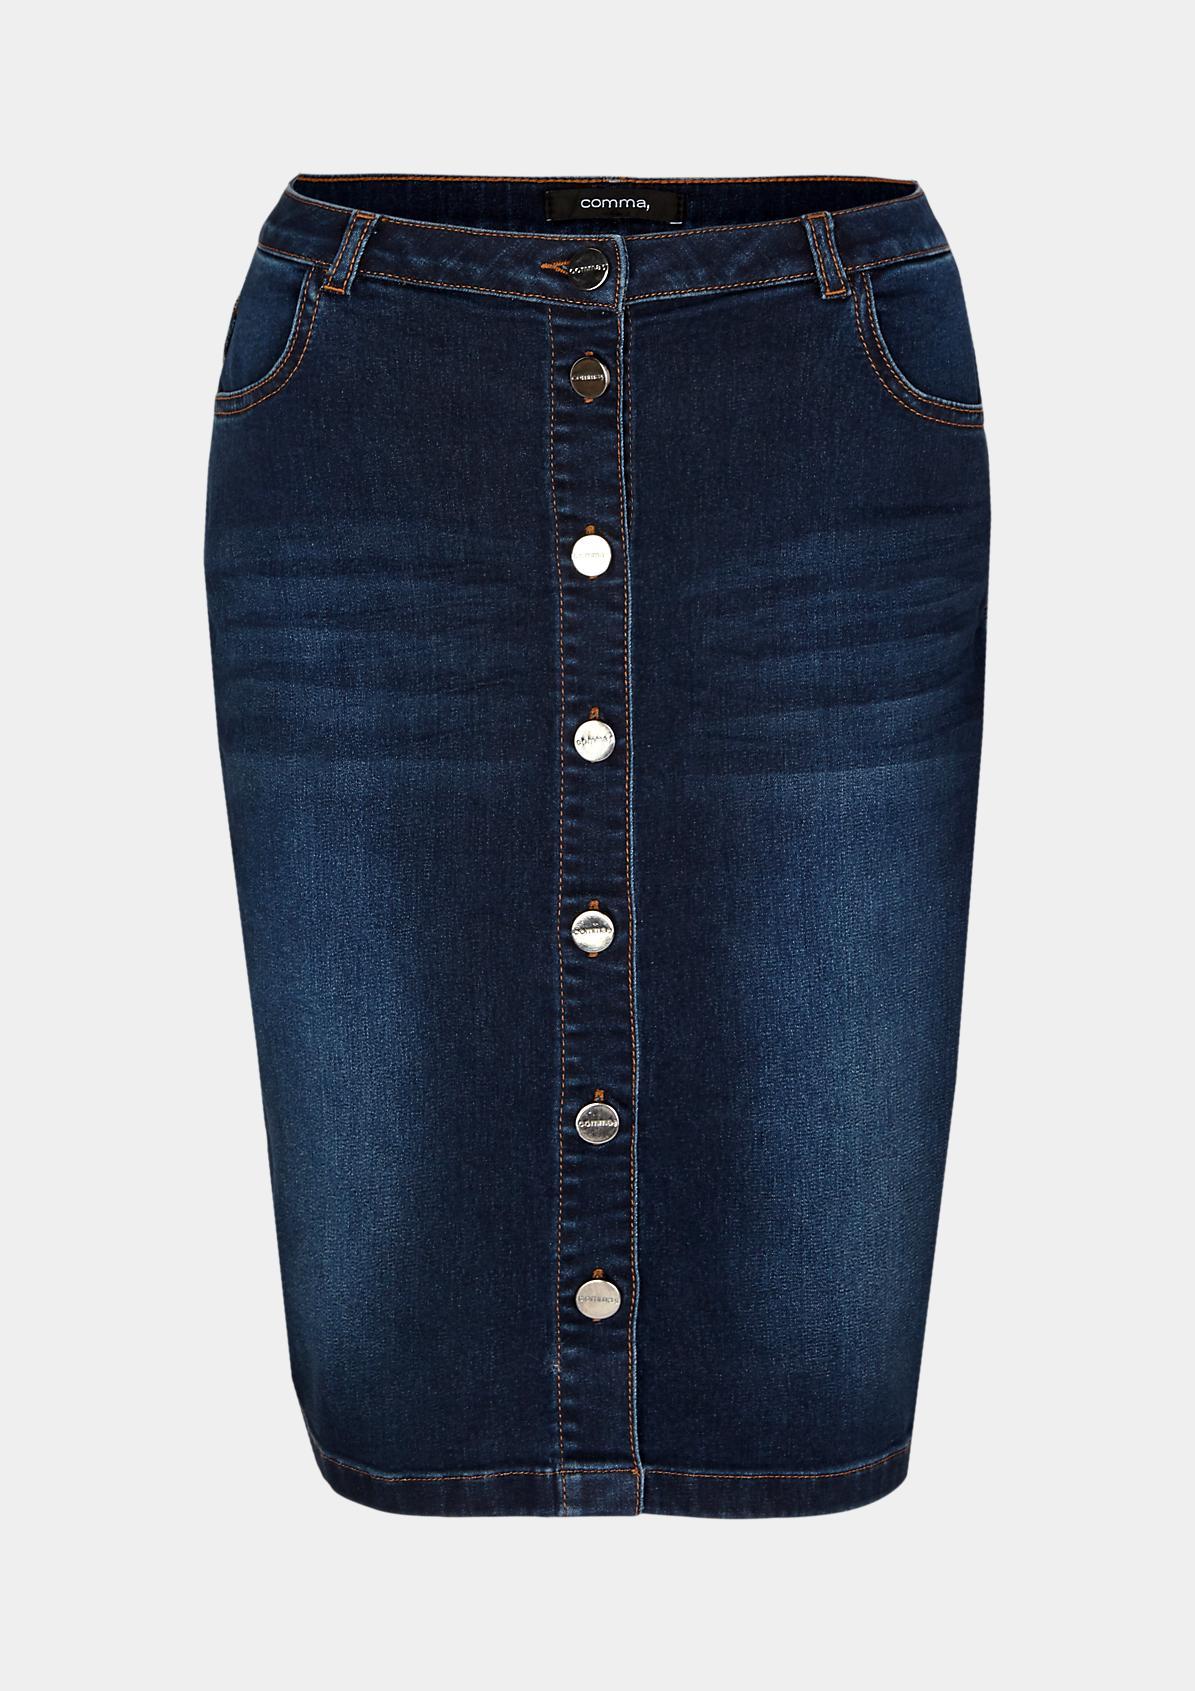 Vintage-look denim skirt from comma